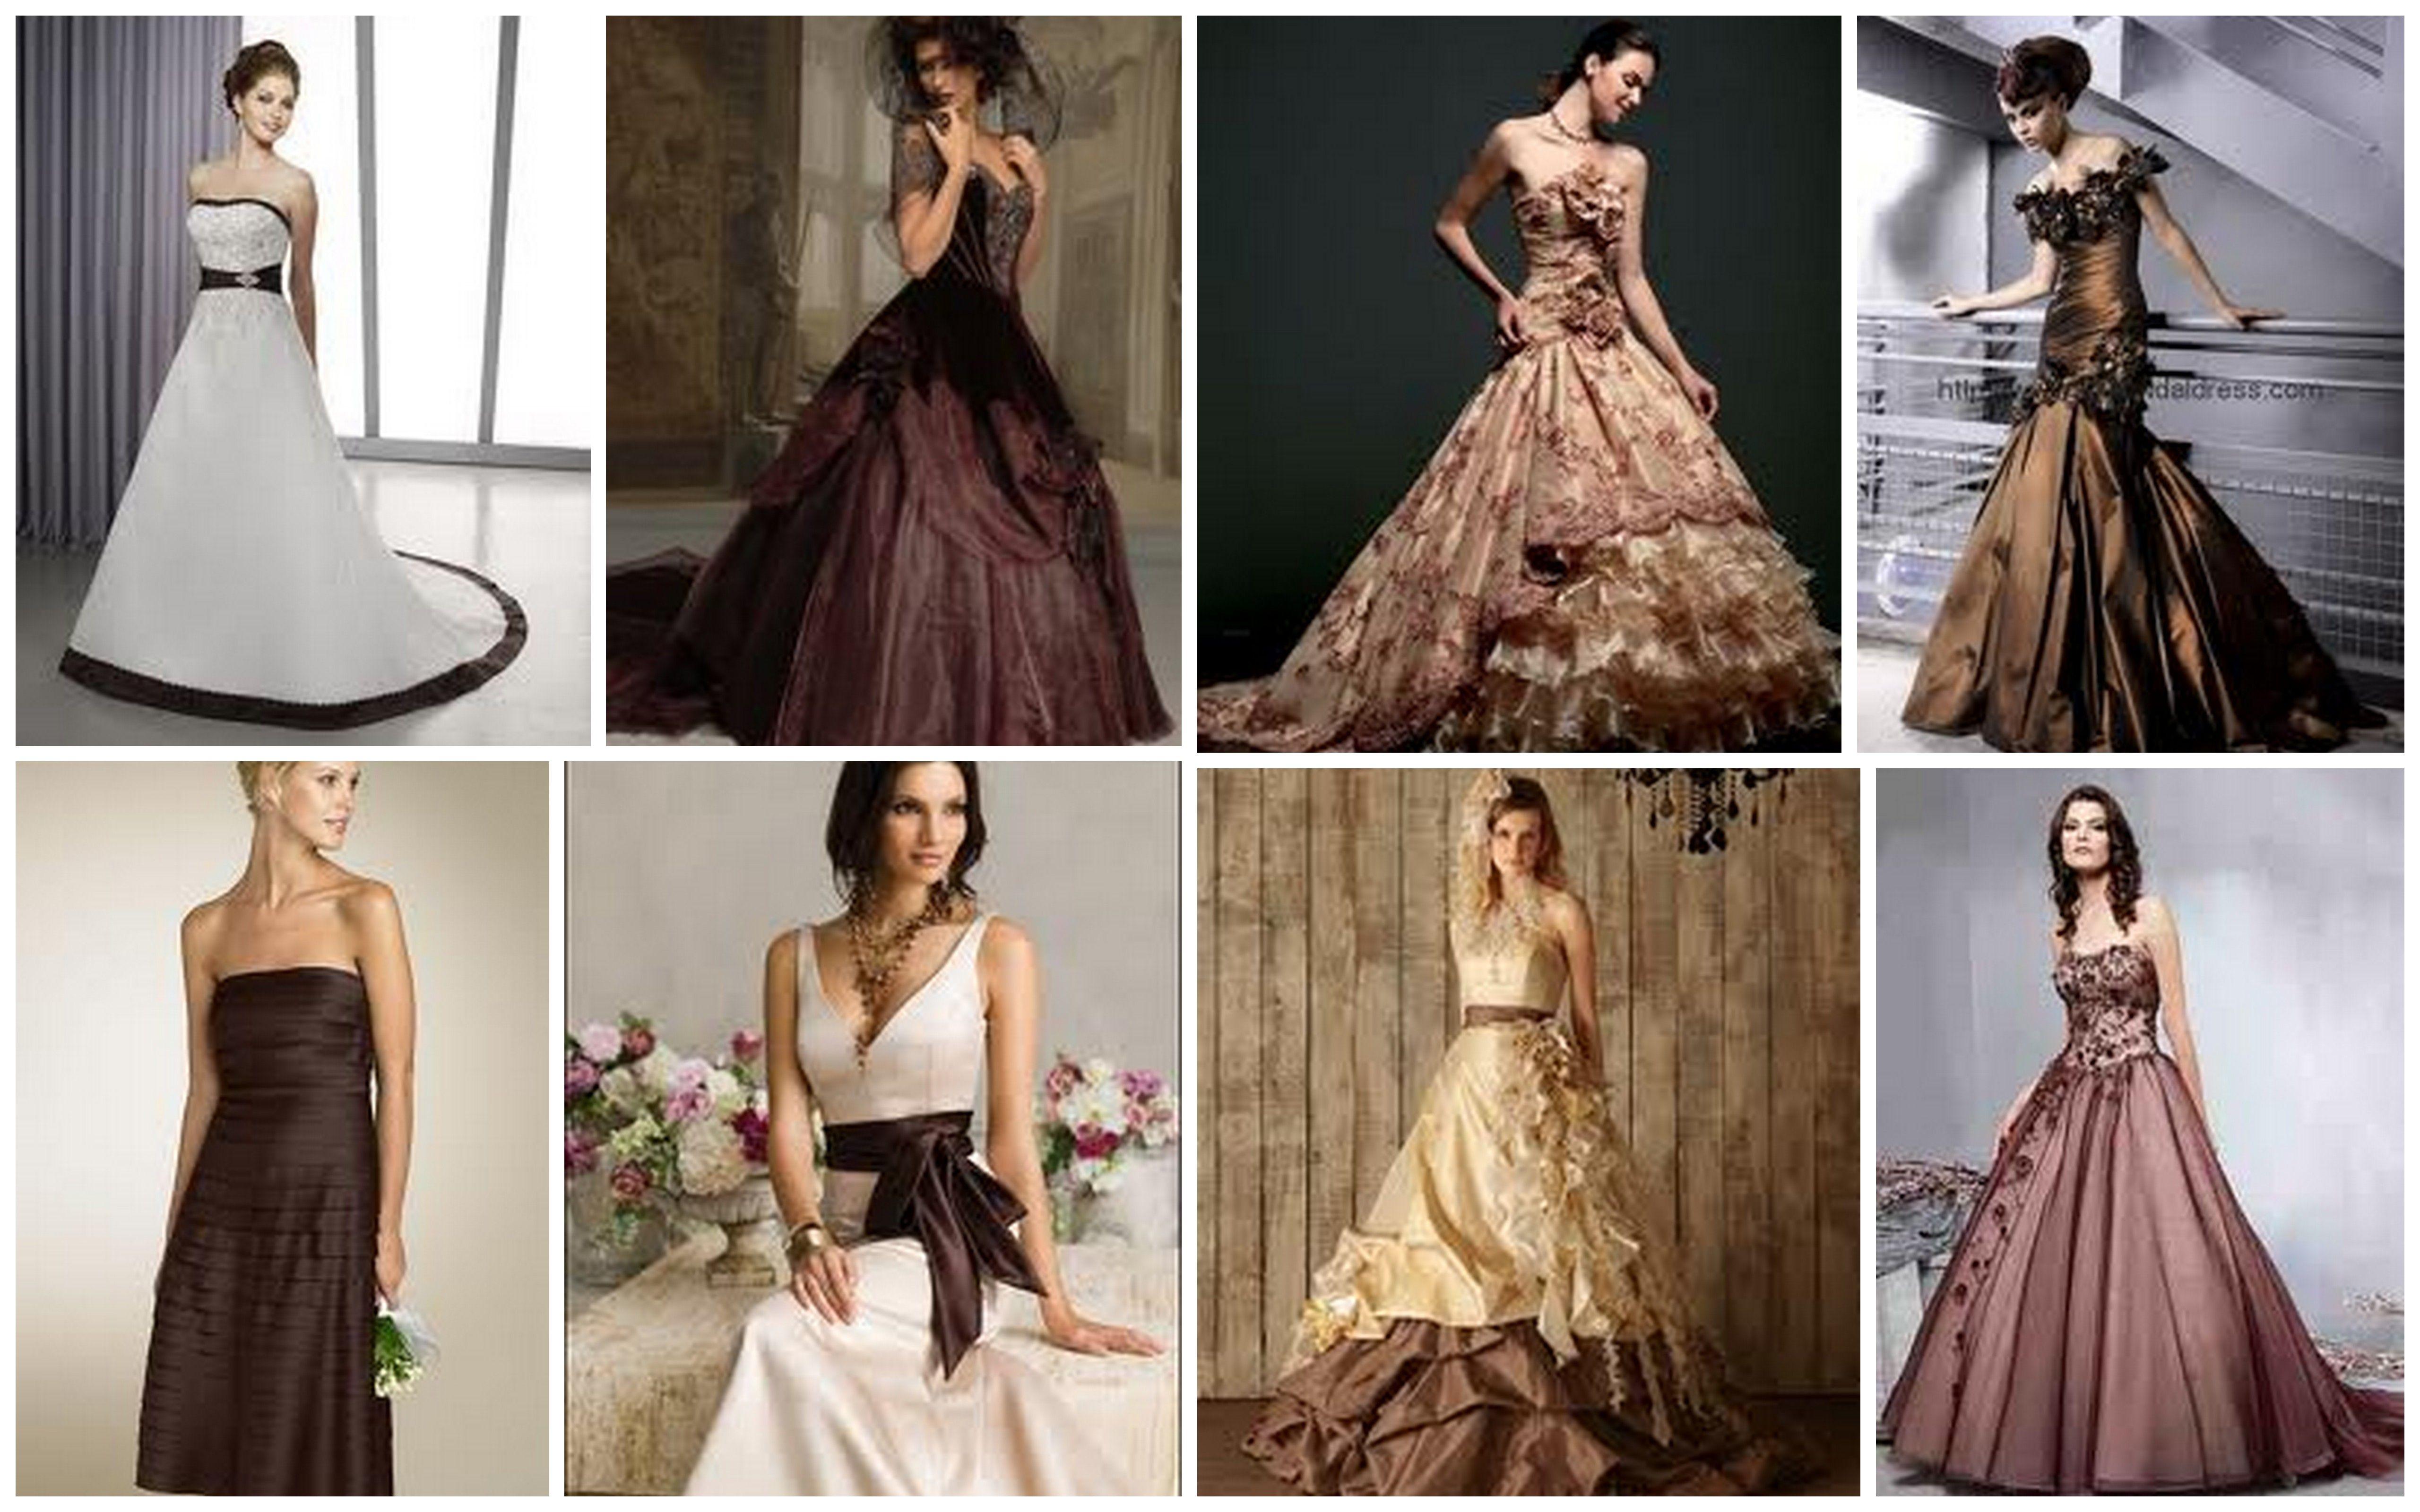 Chocolate brown lace bridesmaid dress fashion dresses chocolate brown lace bridesmaid dress ombrellifo Choice Image